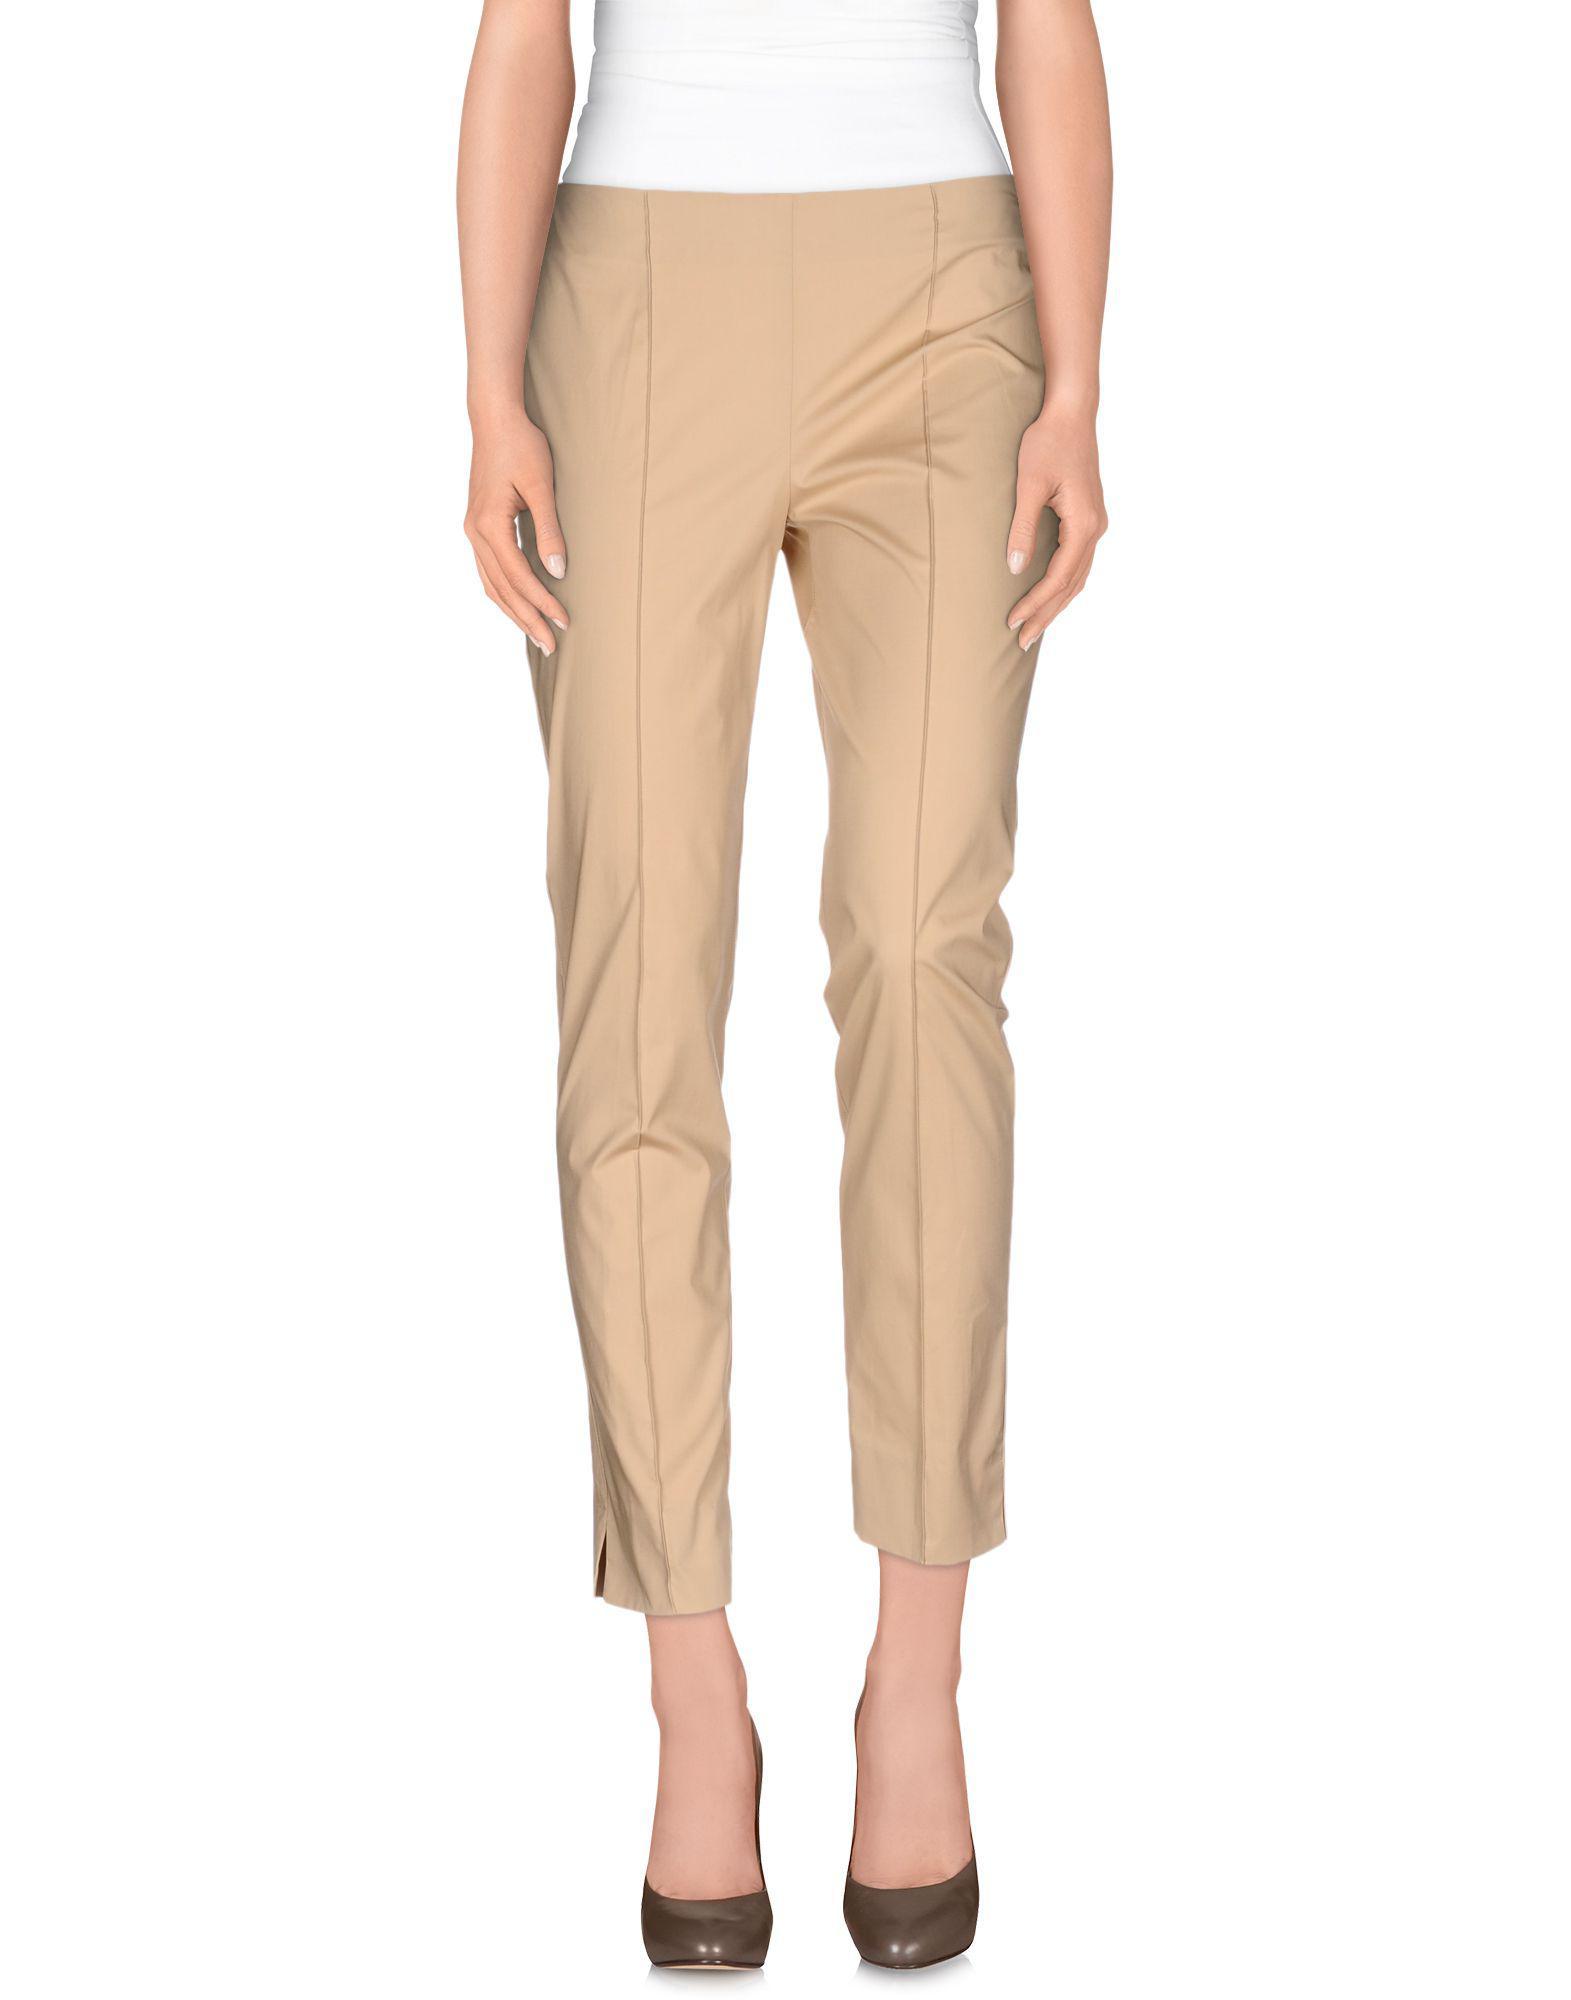 Trousers - 3/4-length Trousers Beatrice. Les Pantalons - 3/4-pantalon Longueur Béatrice. B B W5RMnpcuu